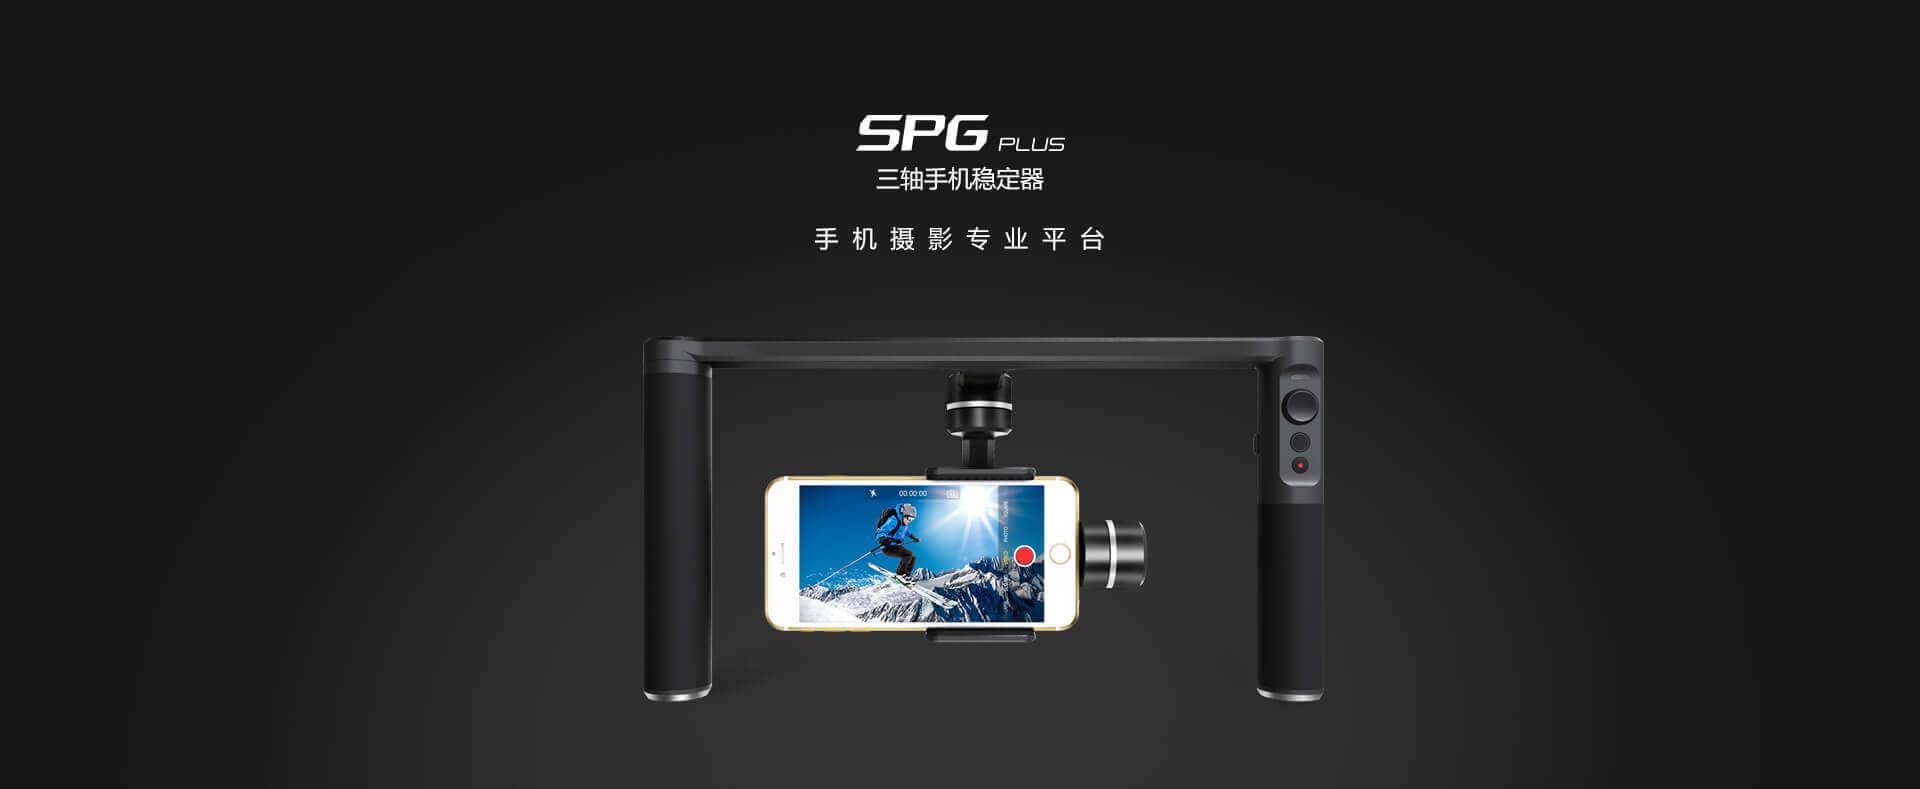 SPG-Plus详情页_01.jpg